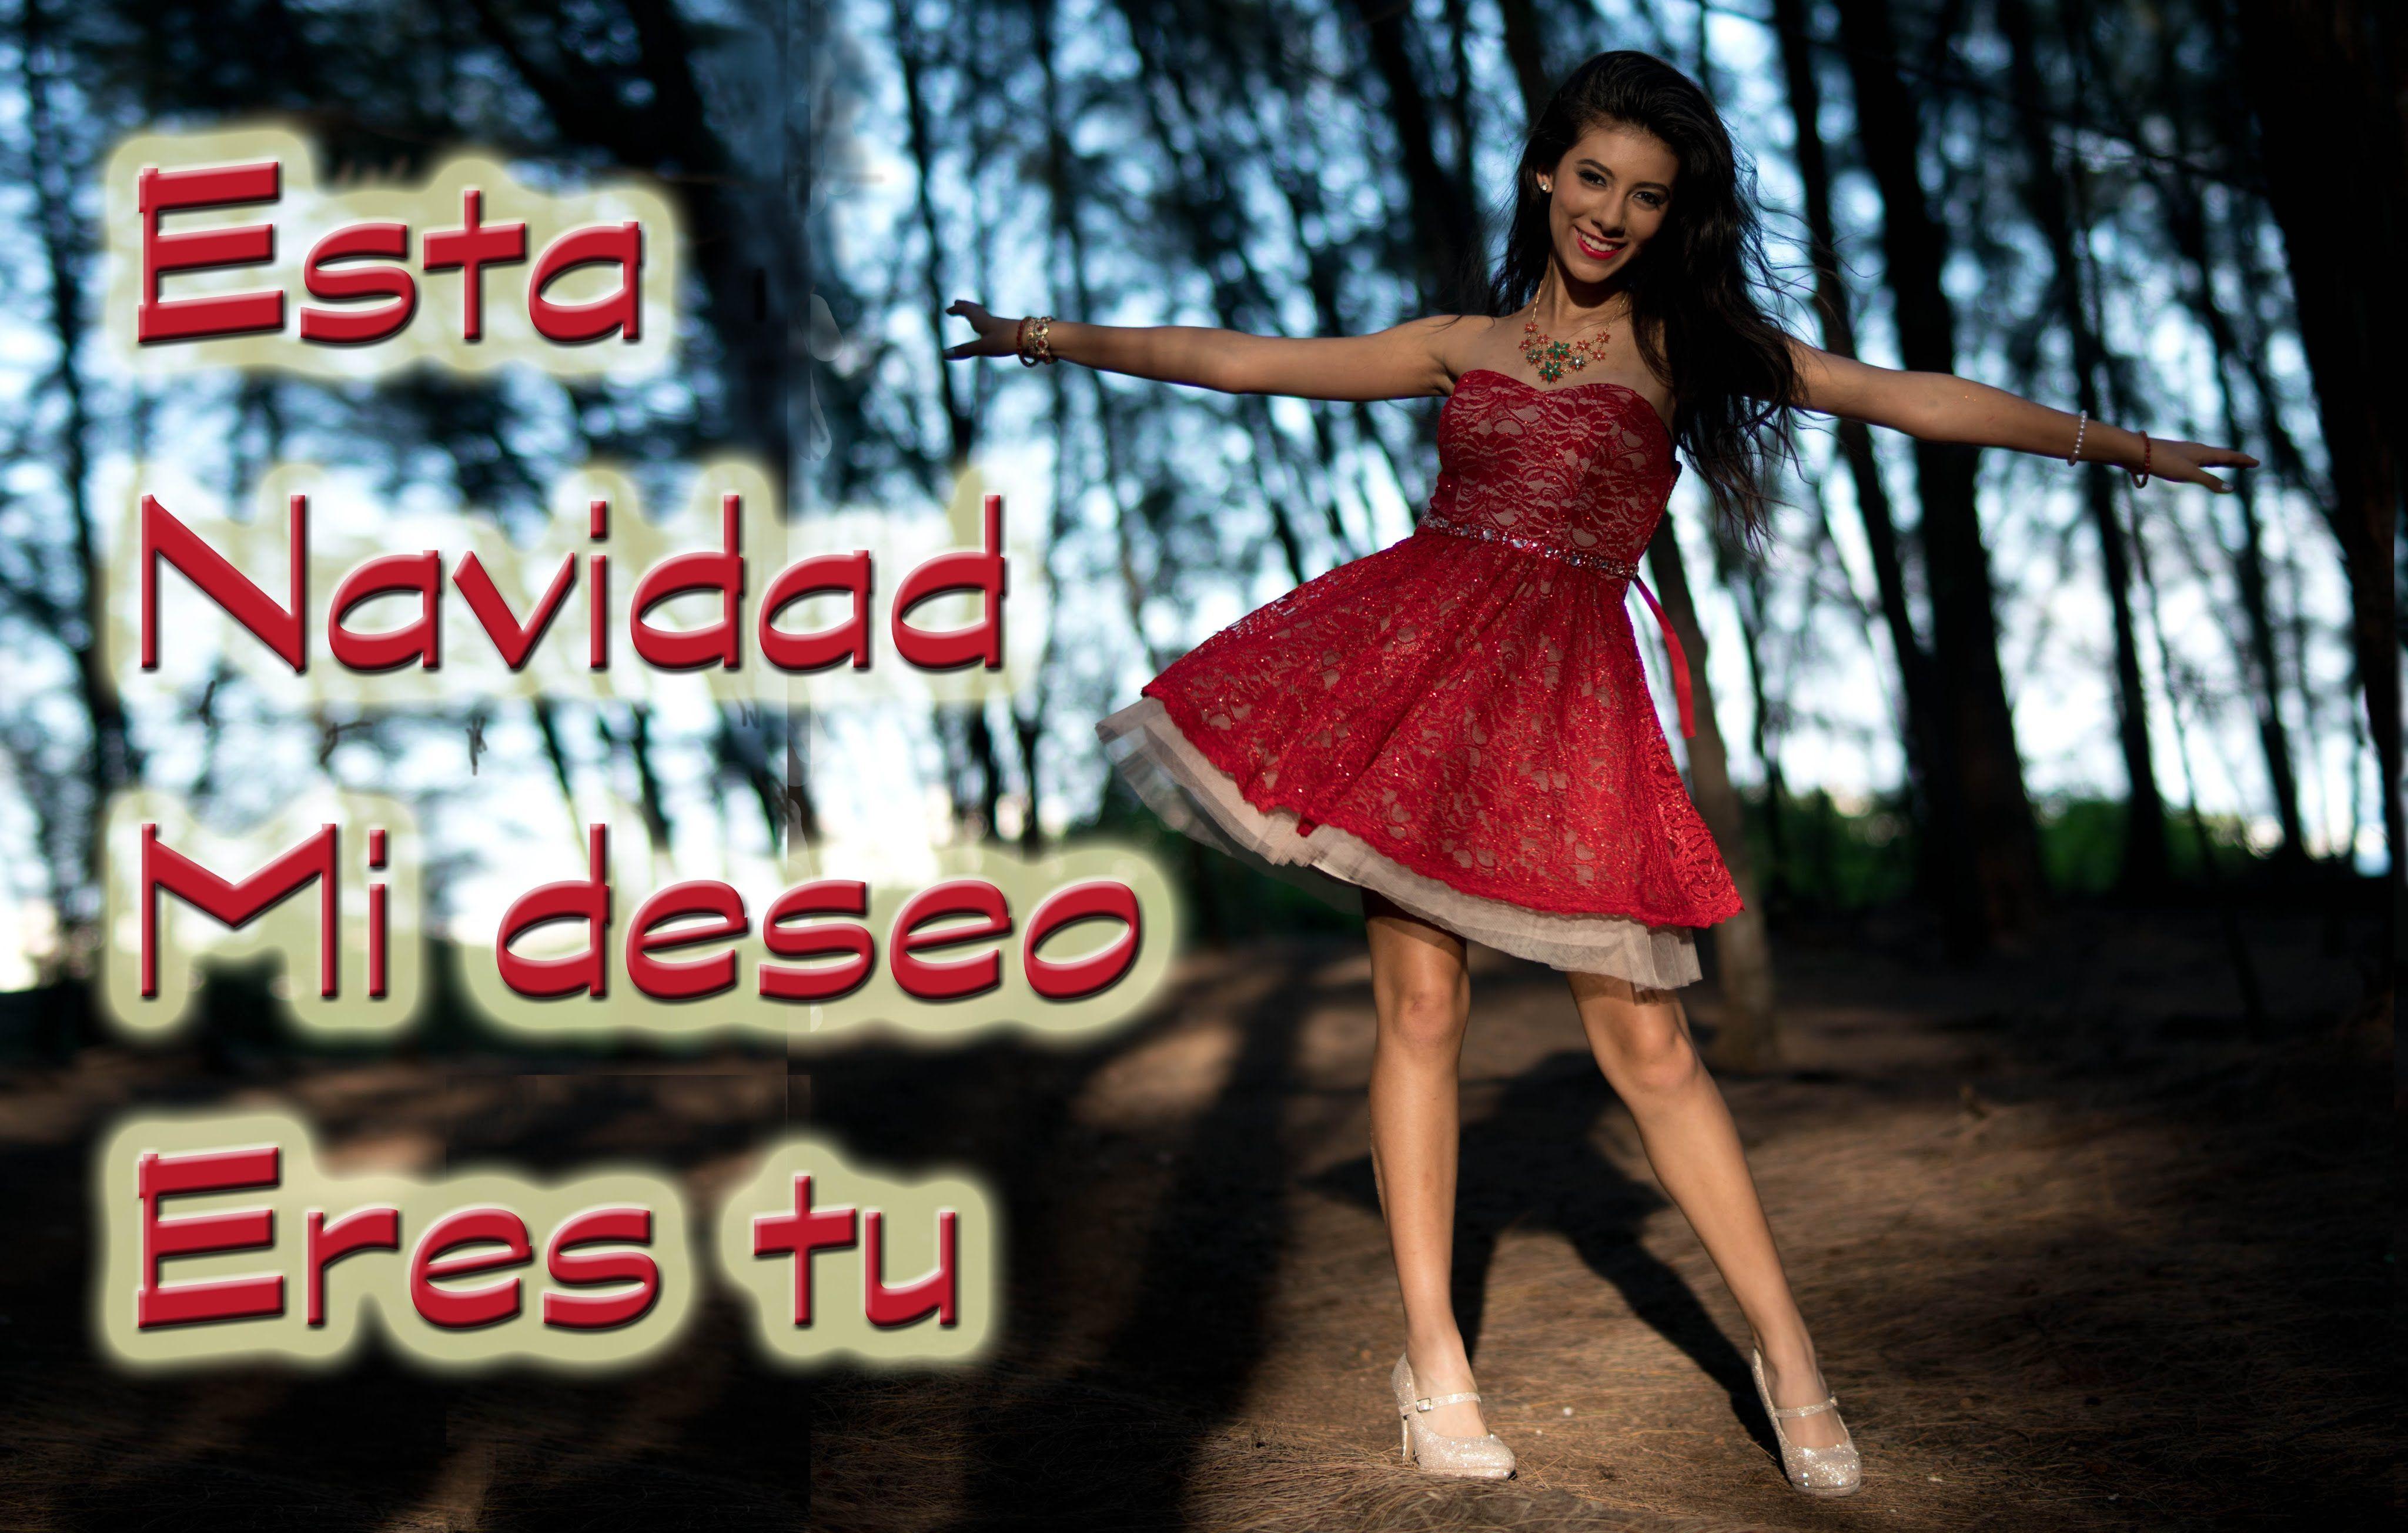 Giselle Esta Navidad Mi Deseo Eres Tu All I Want For Christmas Is Navidad Spanish Christmas Things I Want